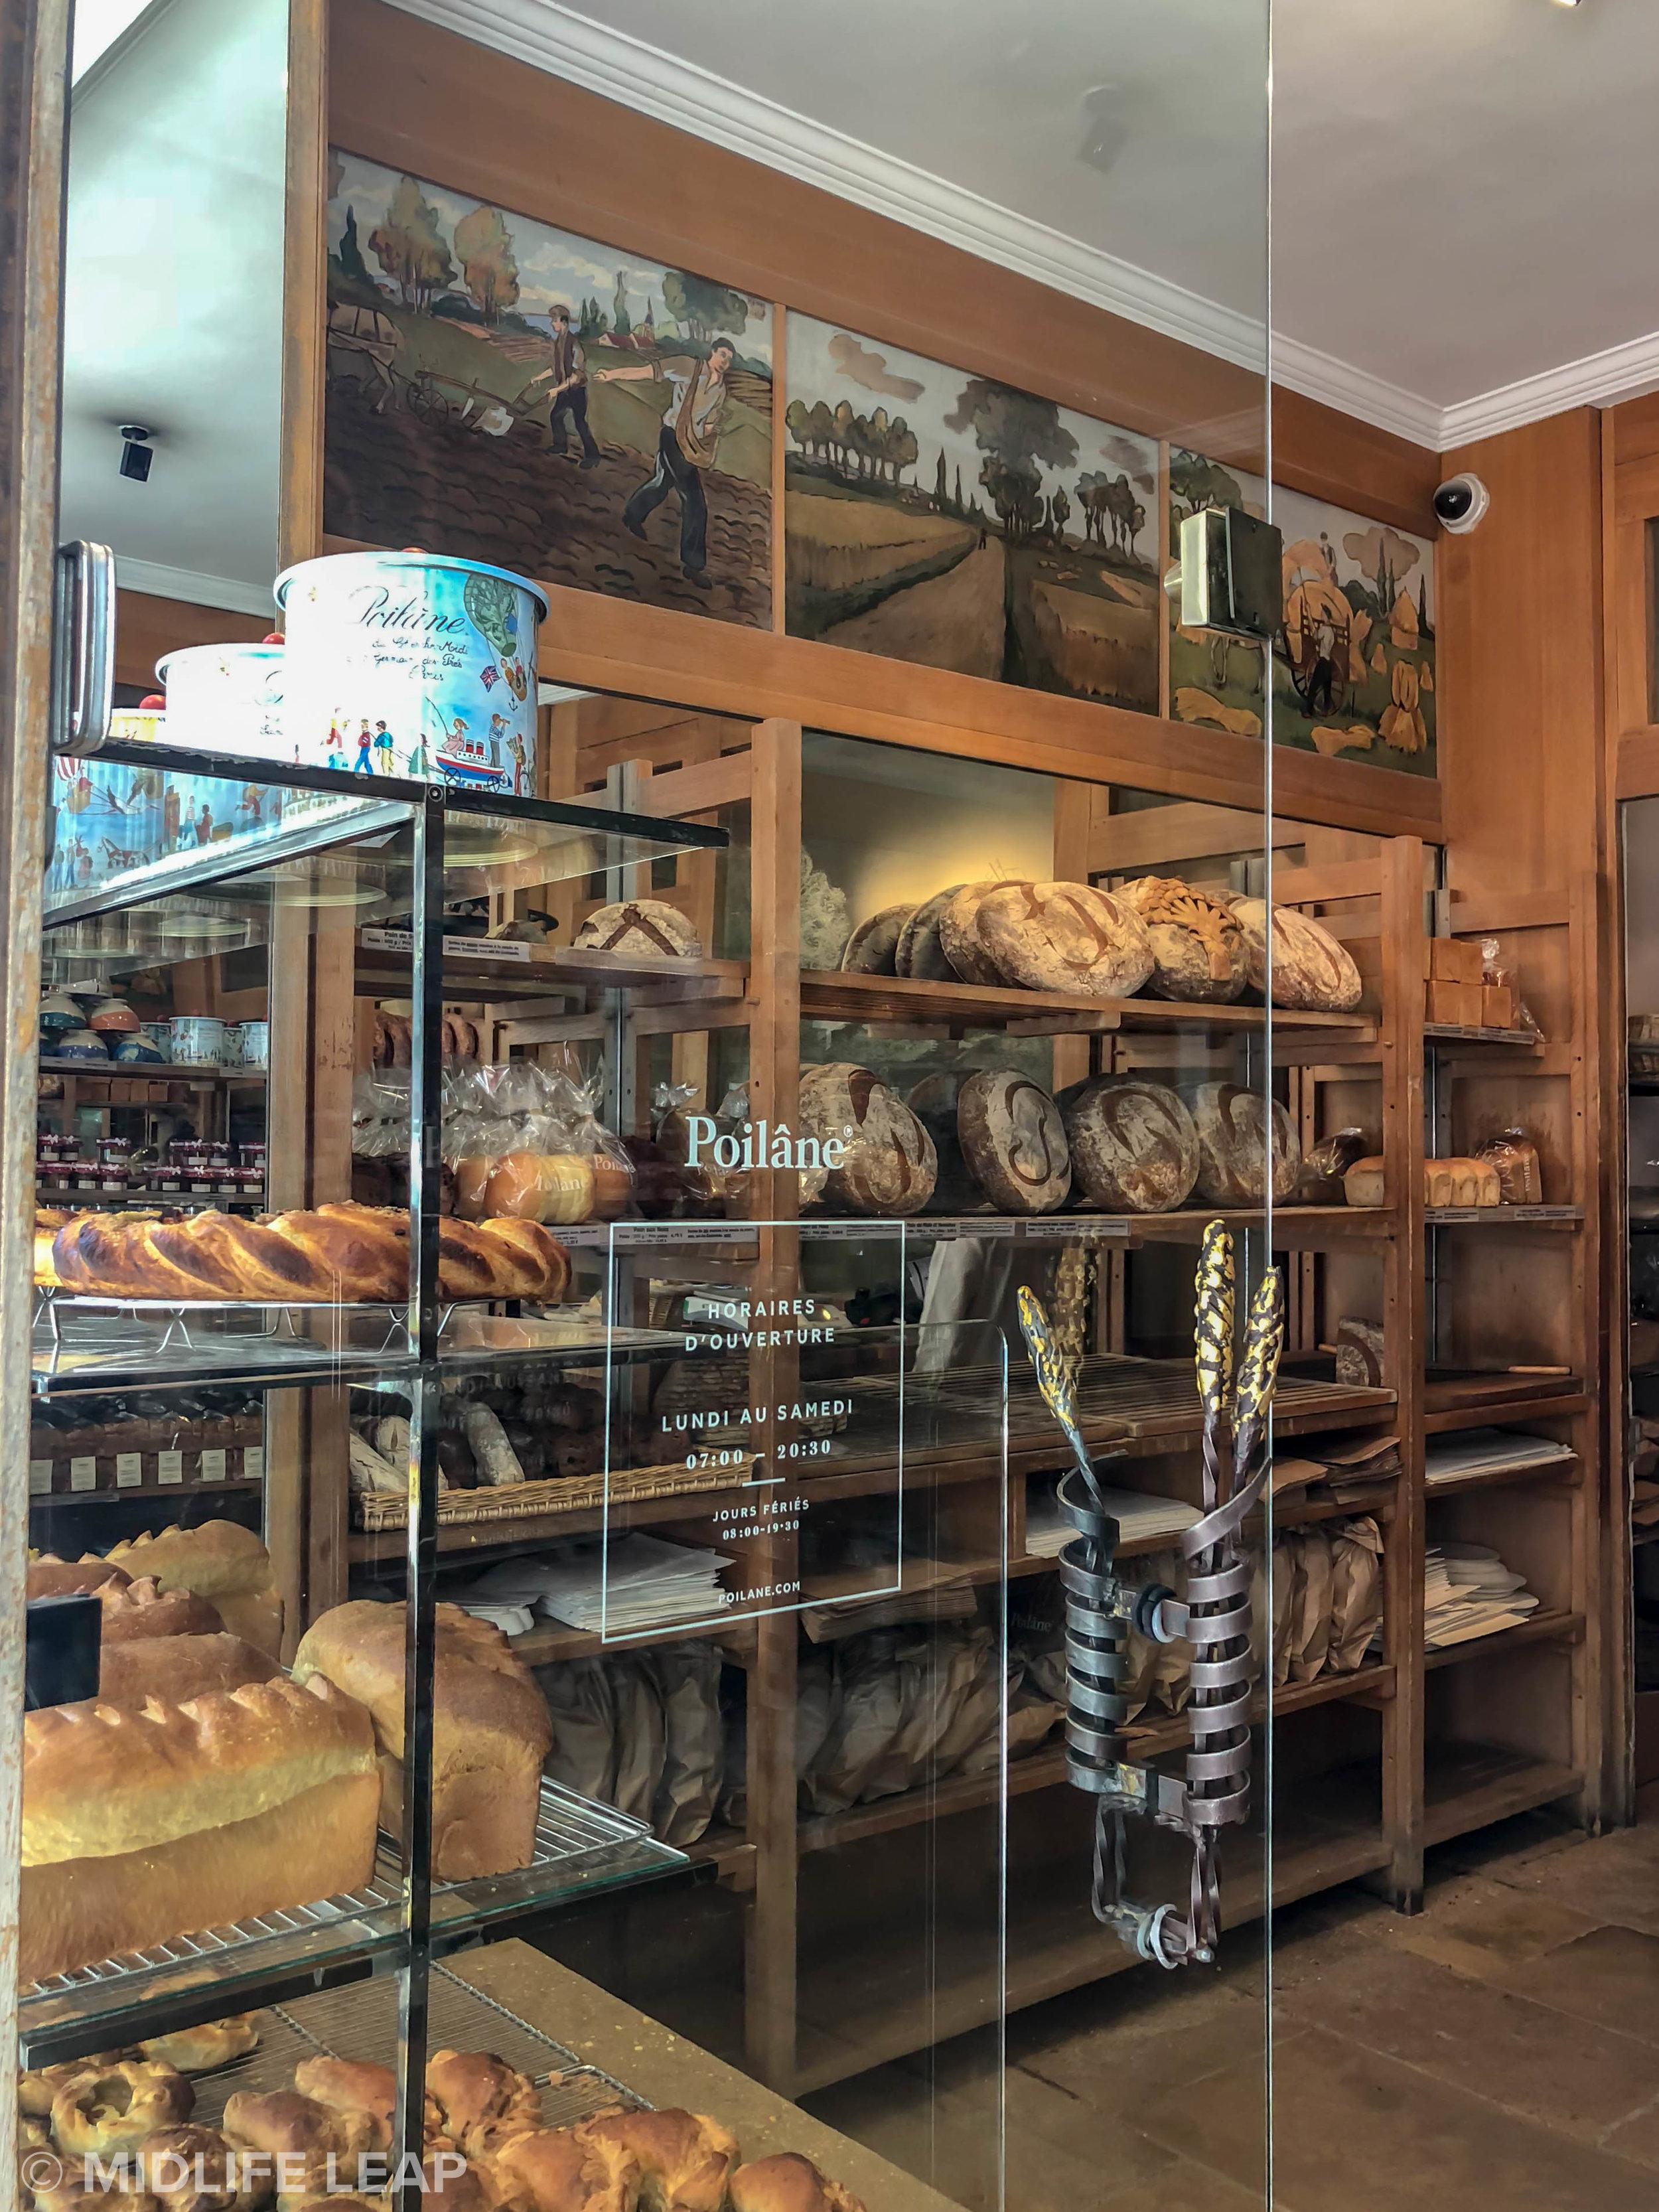 best-boulangeries-in-paris-boulangerie-poilane